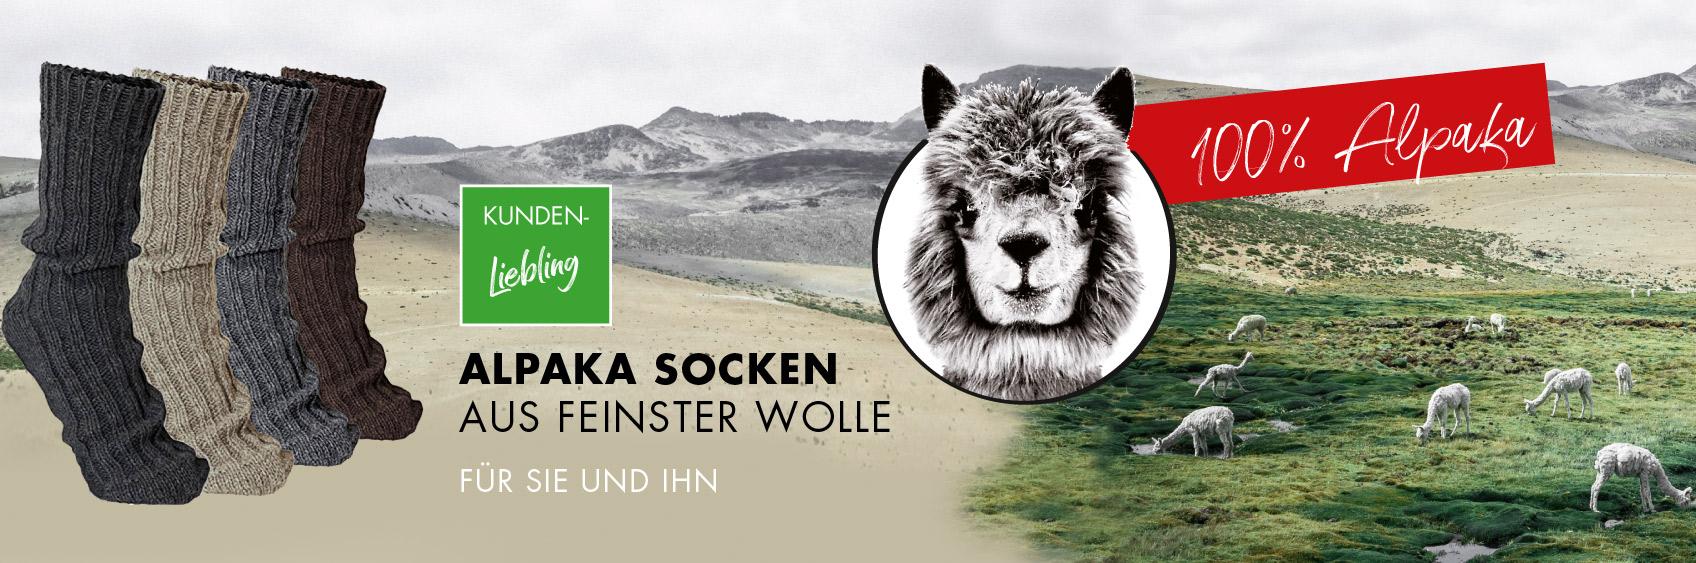 1_Alpaka-Socken_1696x563